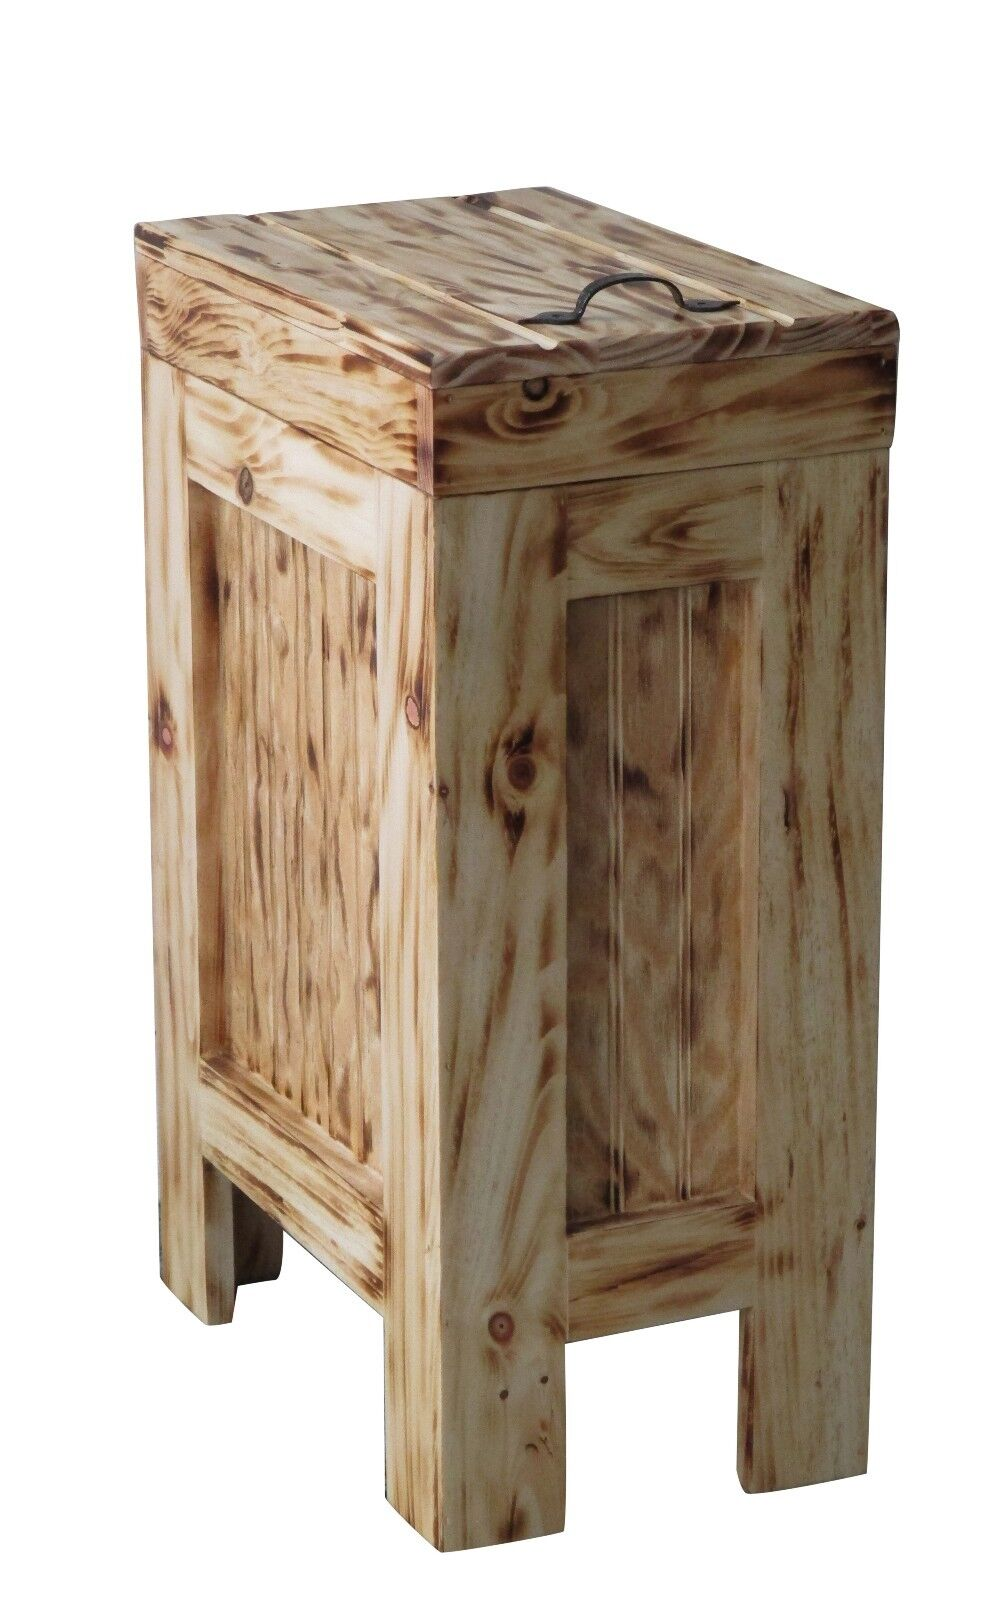 Wood Trash Can Kitchen Garbage Can Rustic Wood Trash Bin Burnt w  Clear Coat